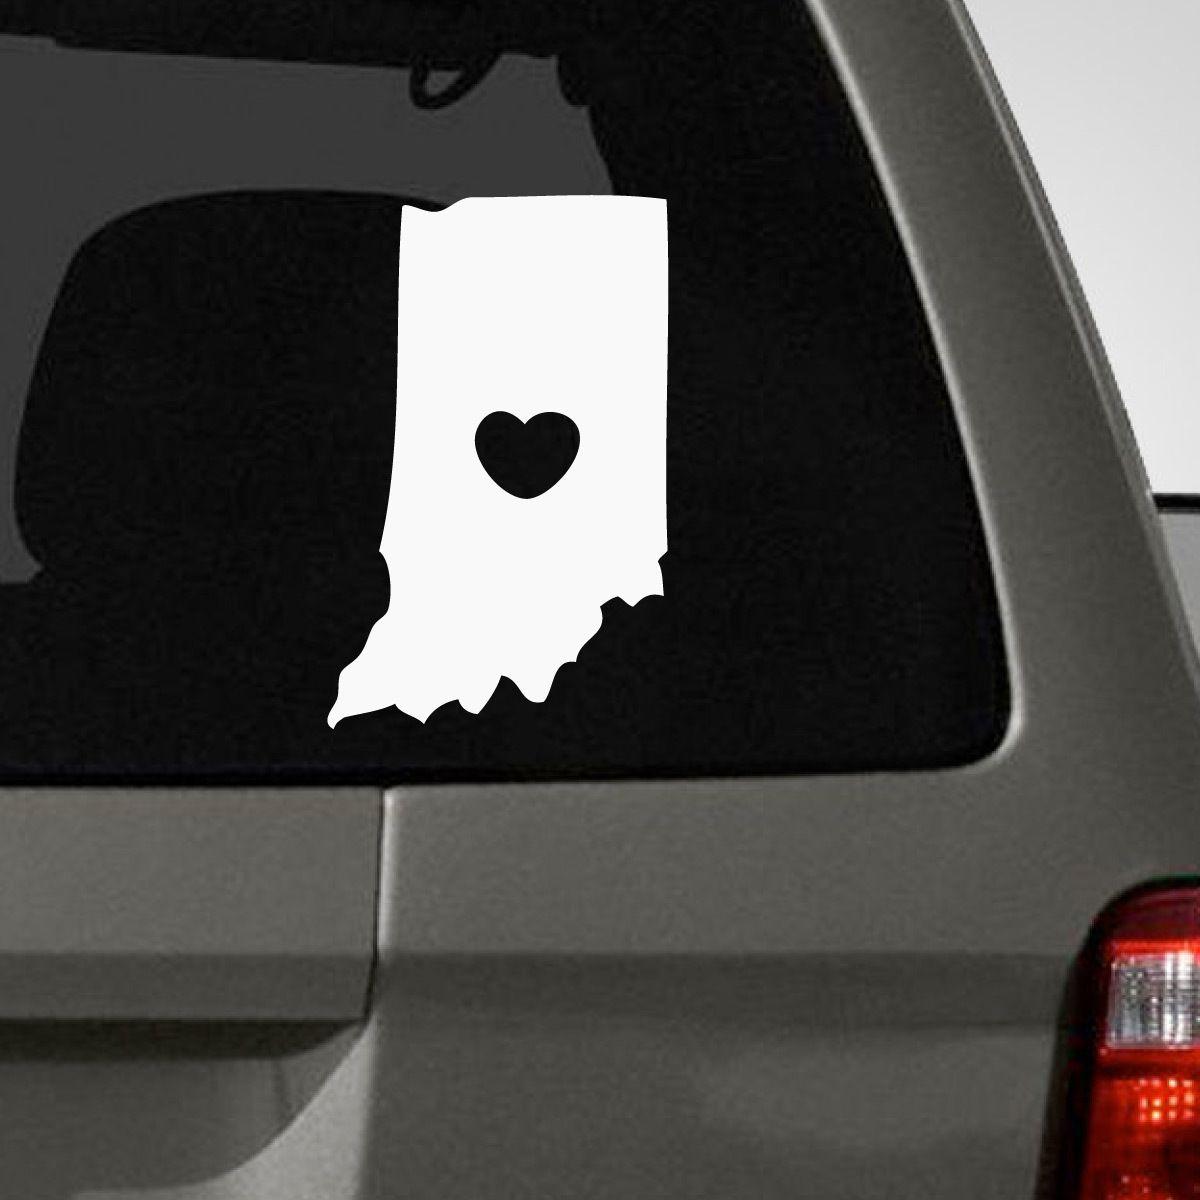 I Love Indiana Car Decal Car Decals Indiana Decals [ 1200 x 1200 Pixel ]